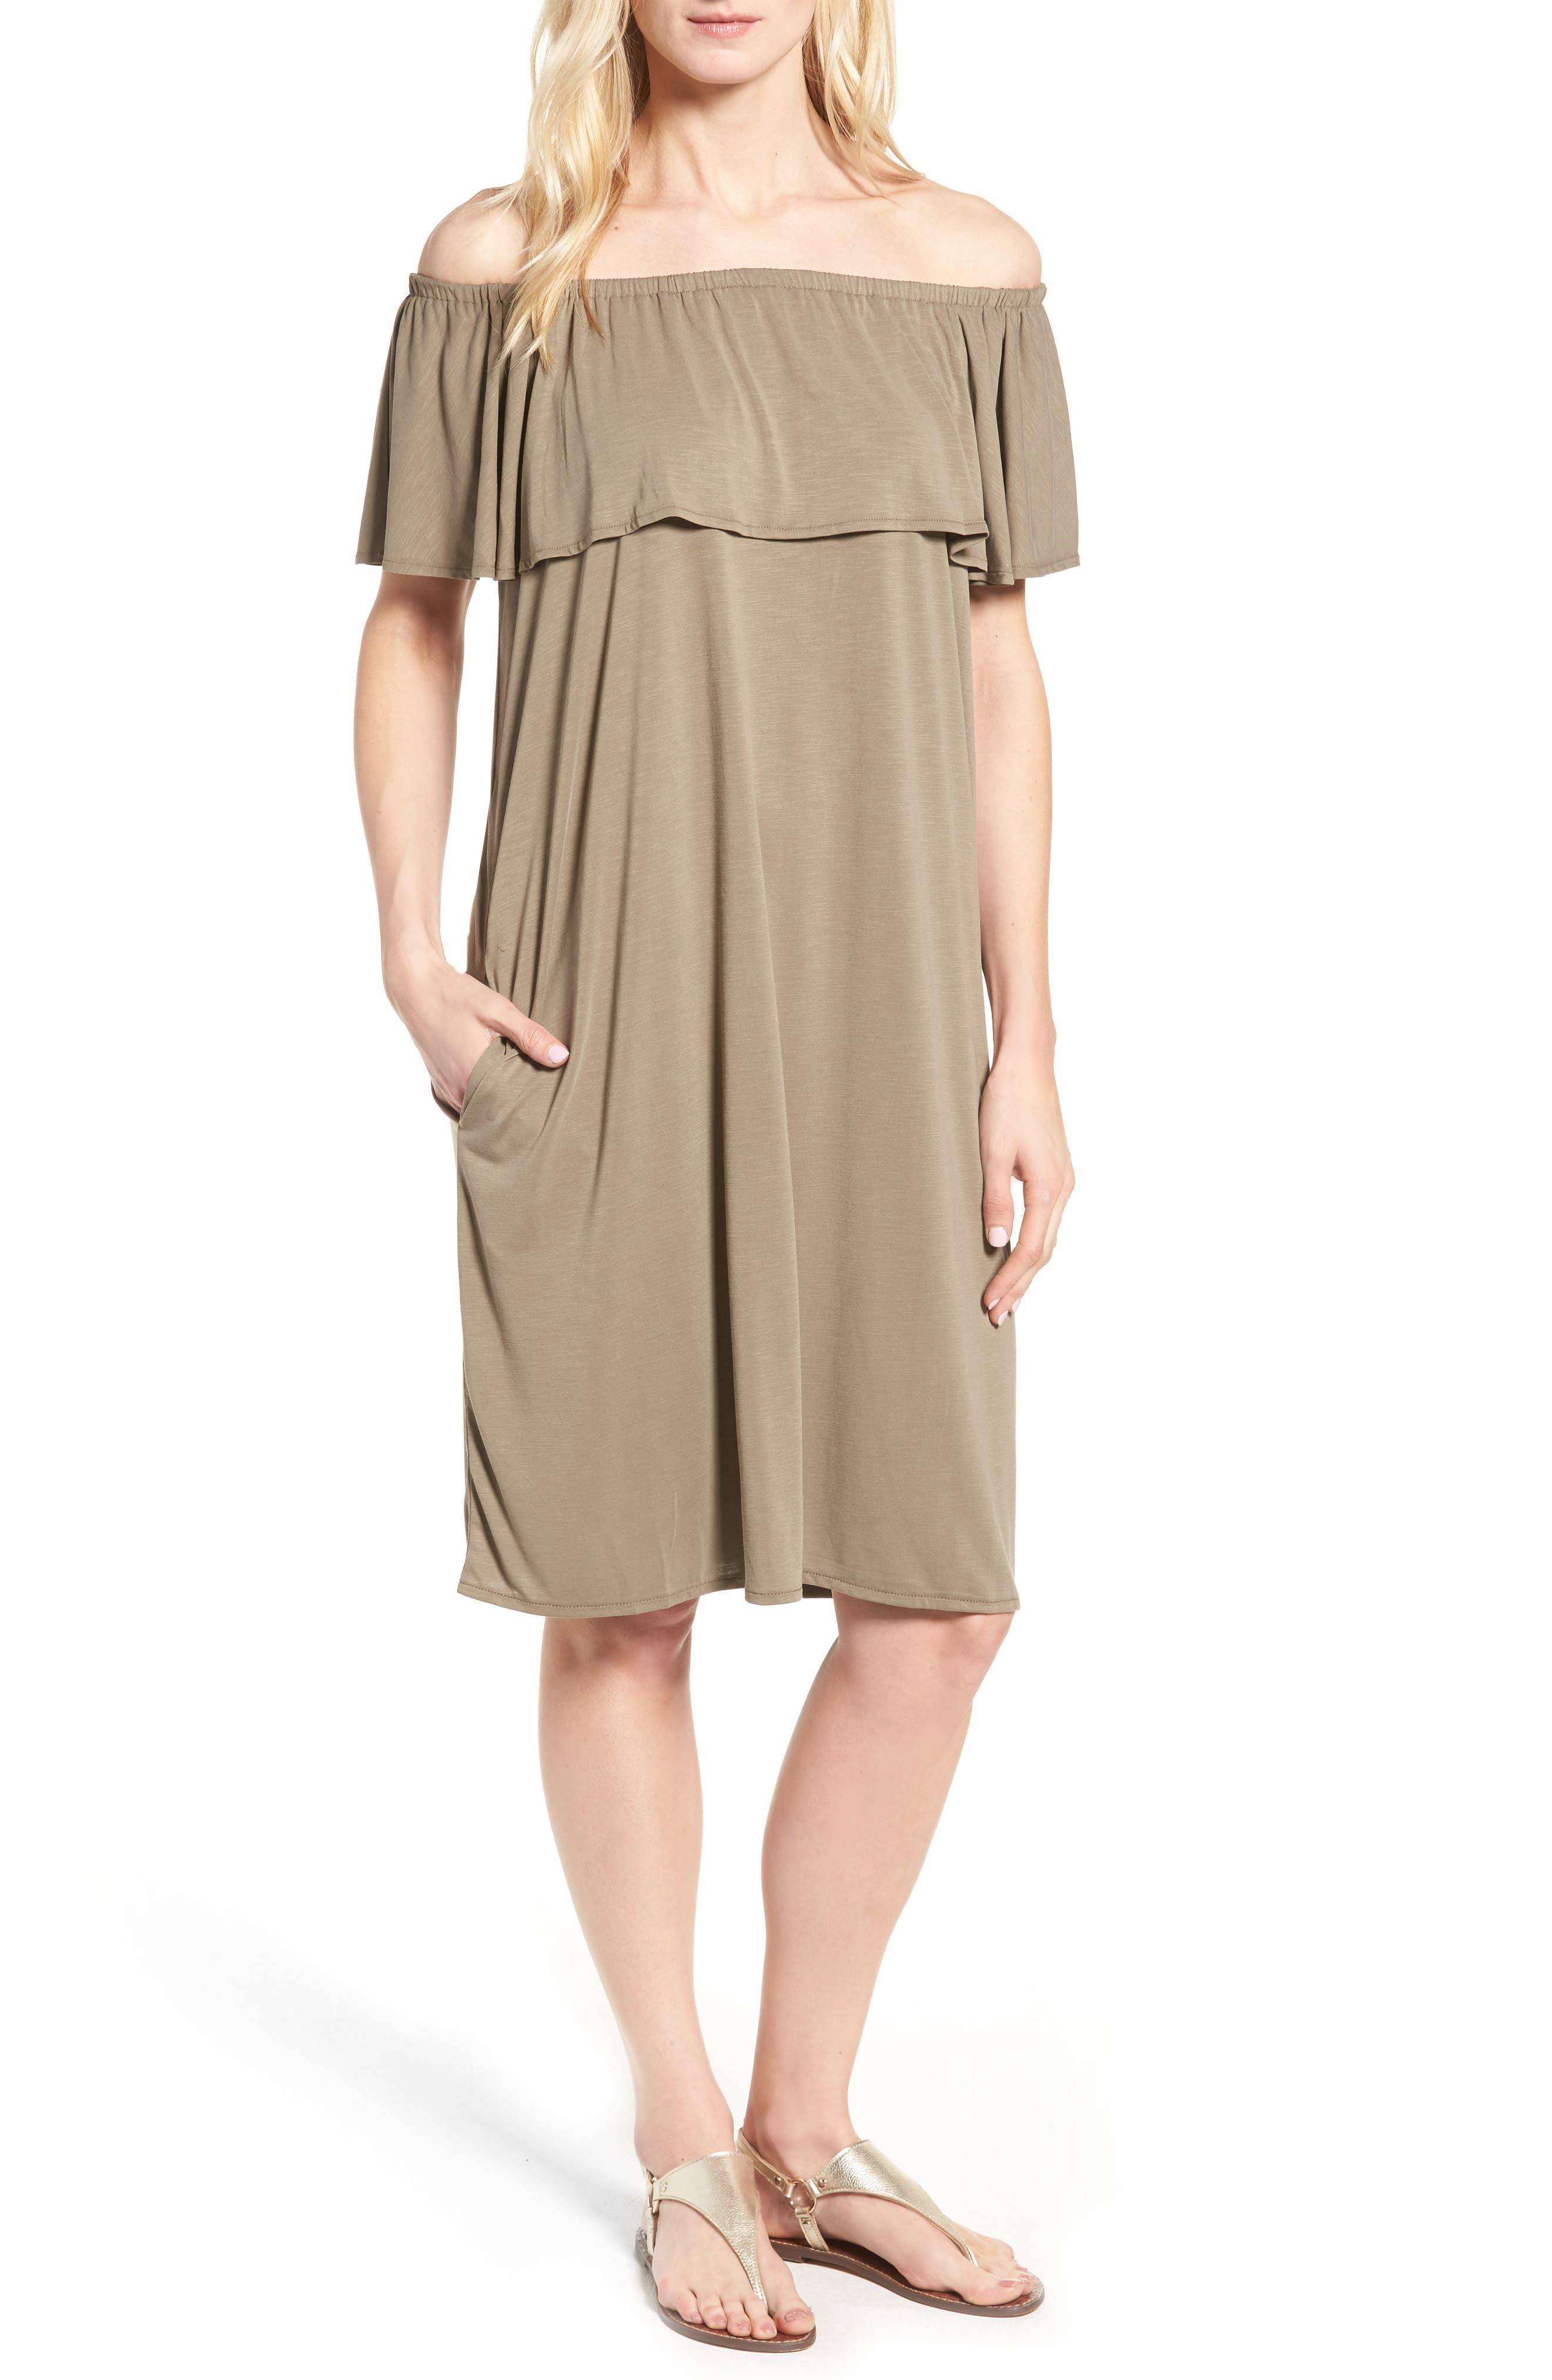 Boardwalk Convertible Jersey Dress,                             Main thumbnail 1, color,                             Washed Marshland